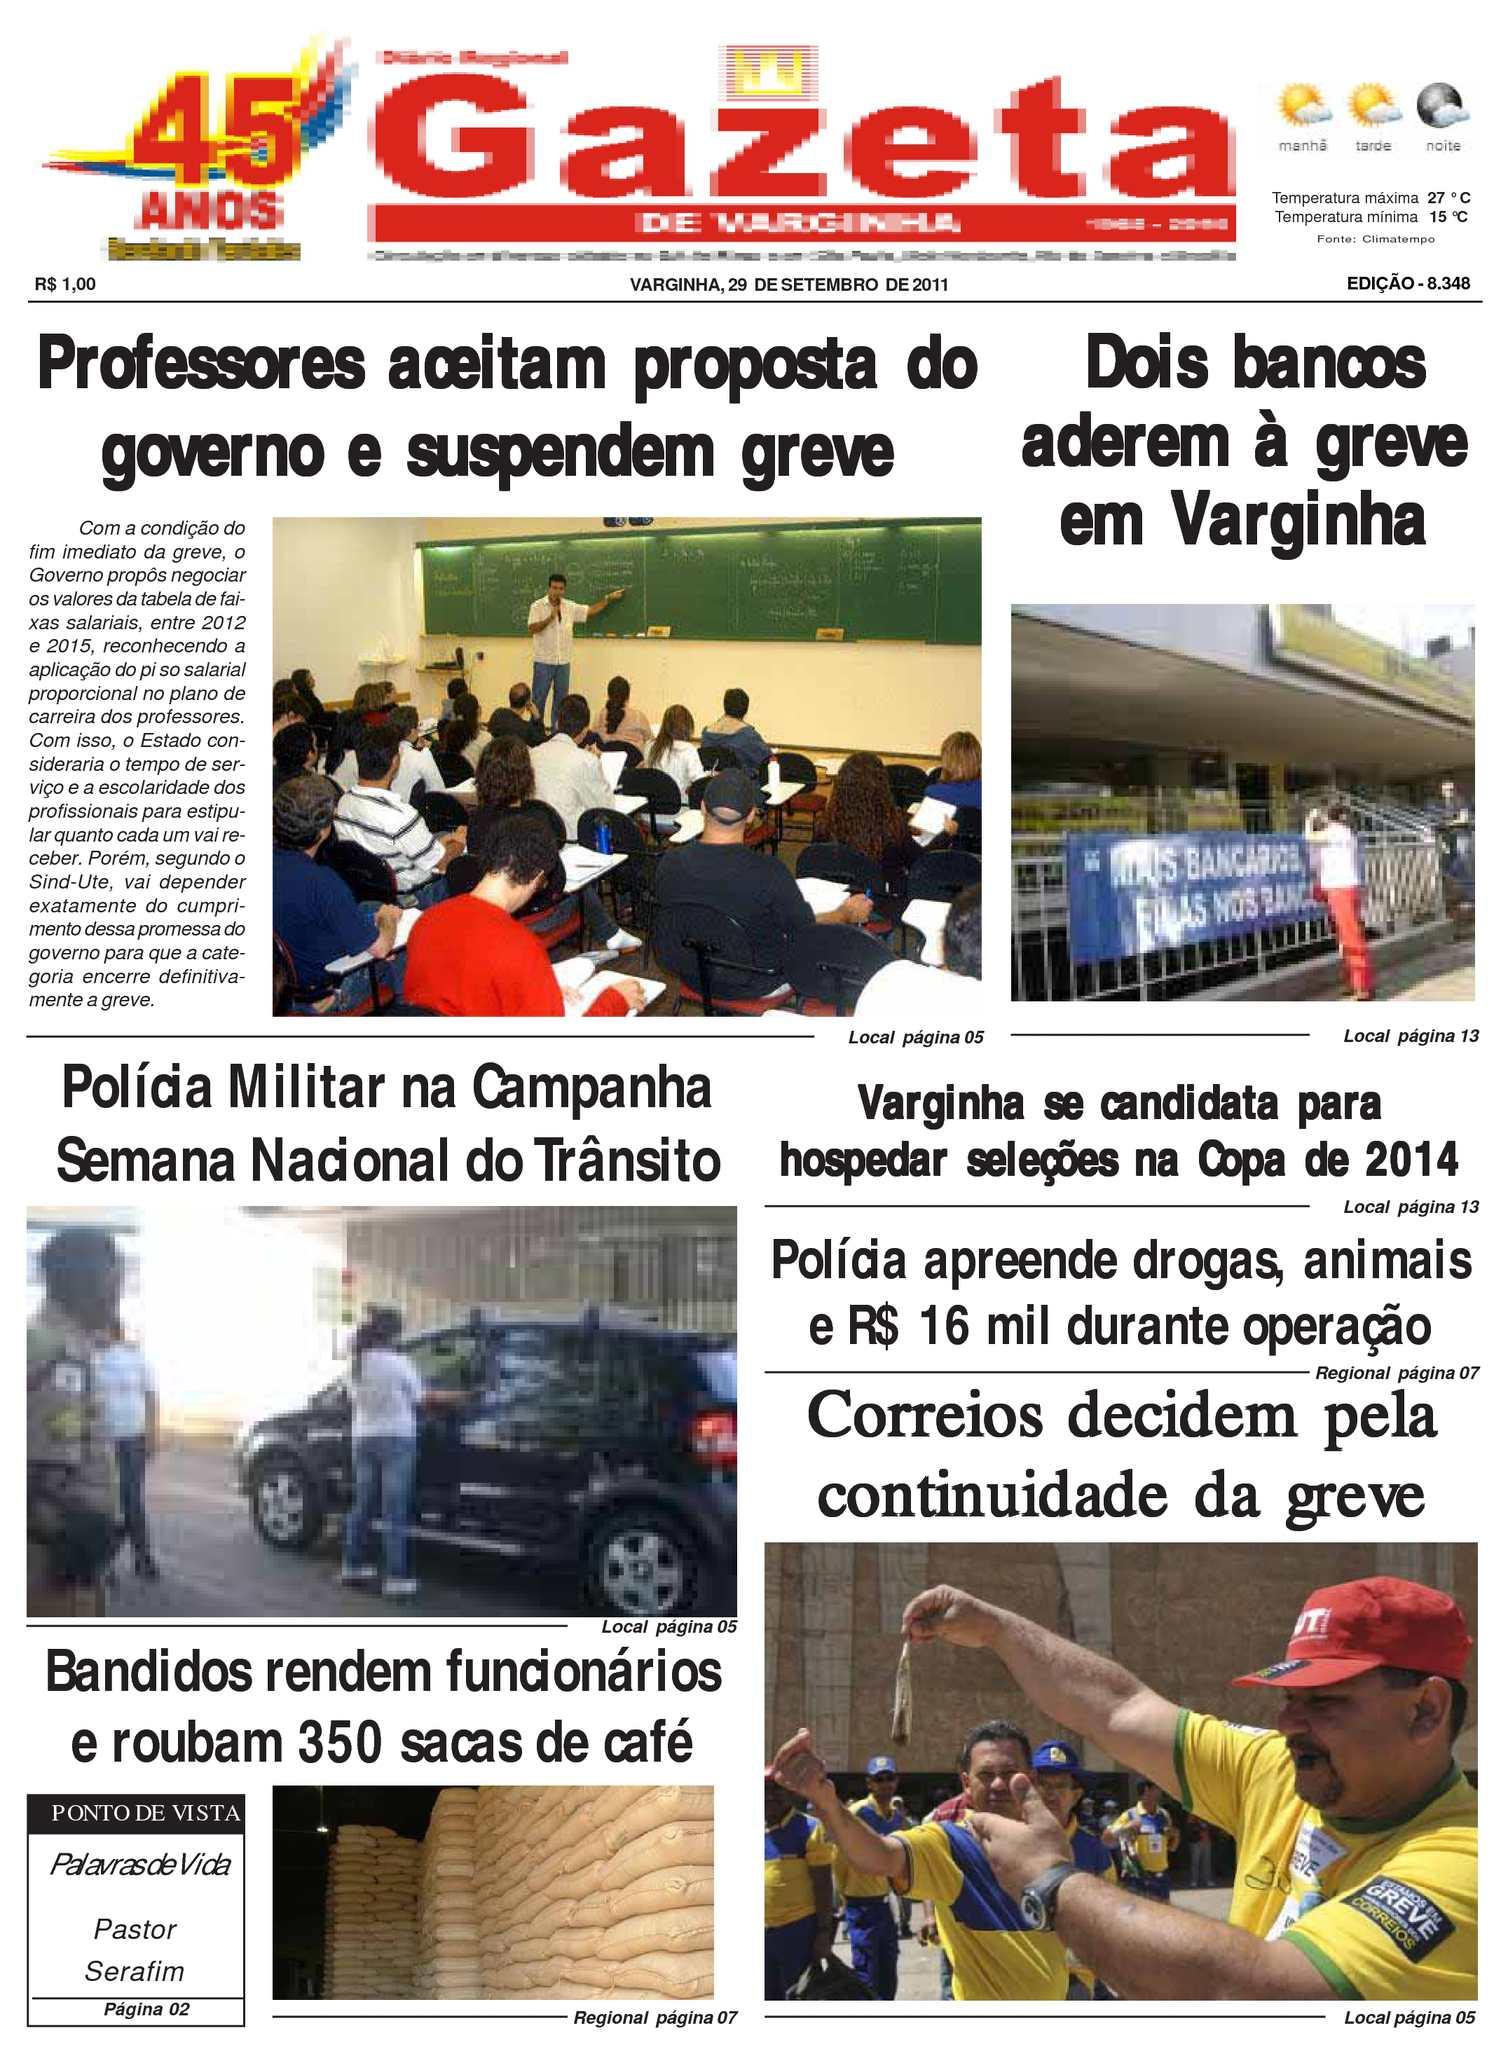 3127276378 Calaméo - Jornal Gazeta de varginha 29 09 2011